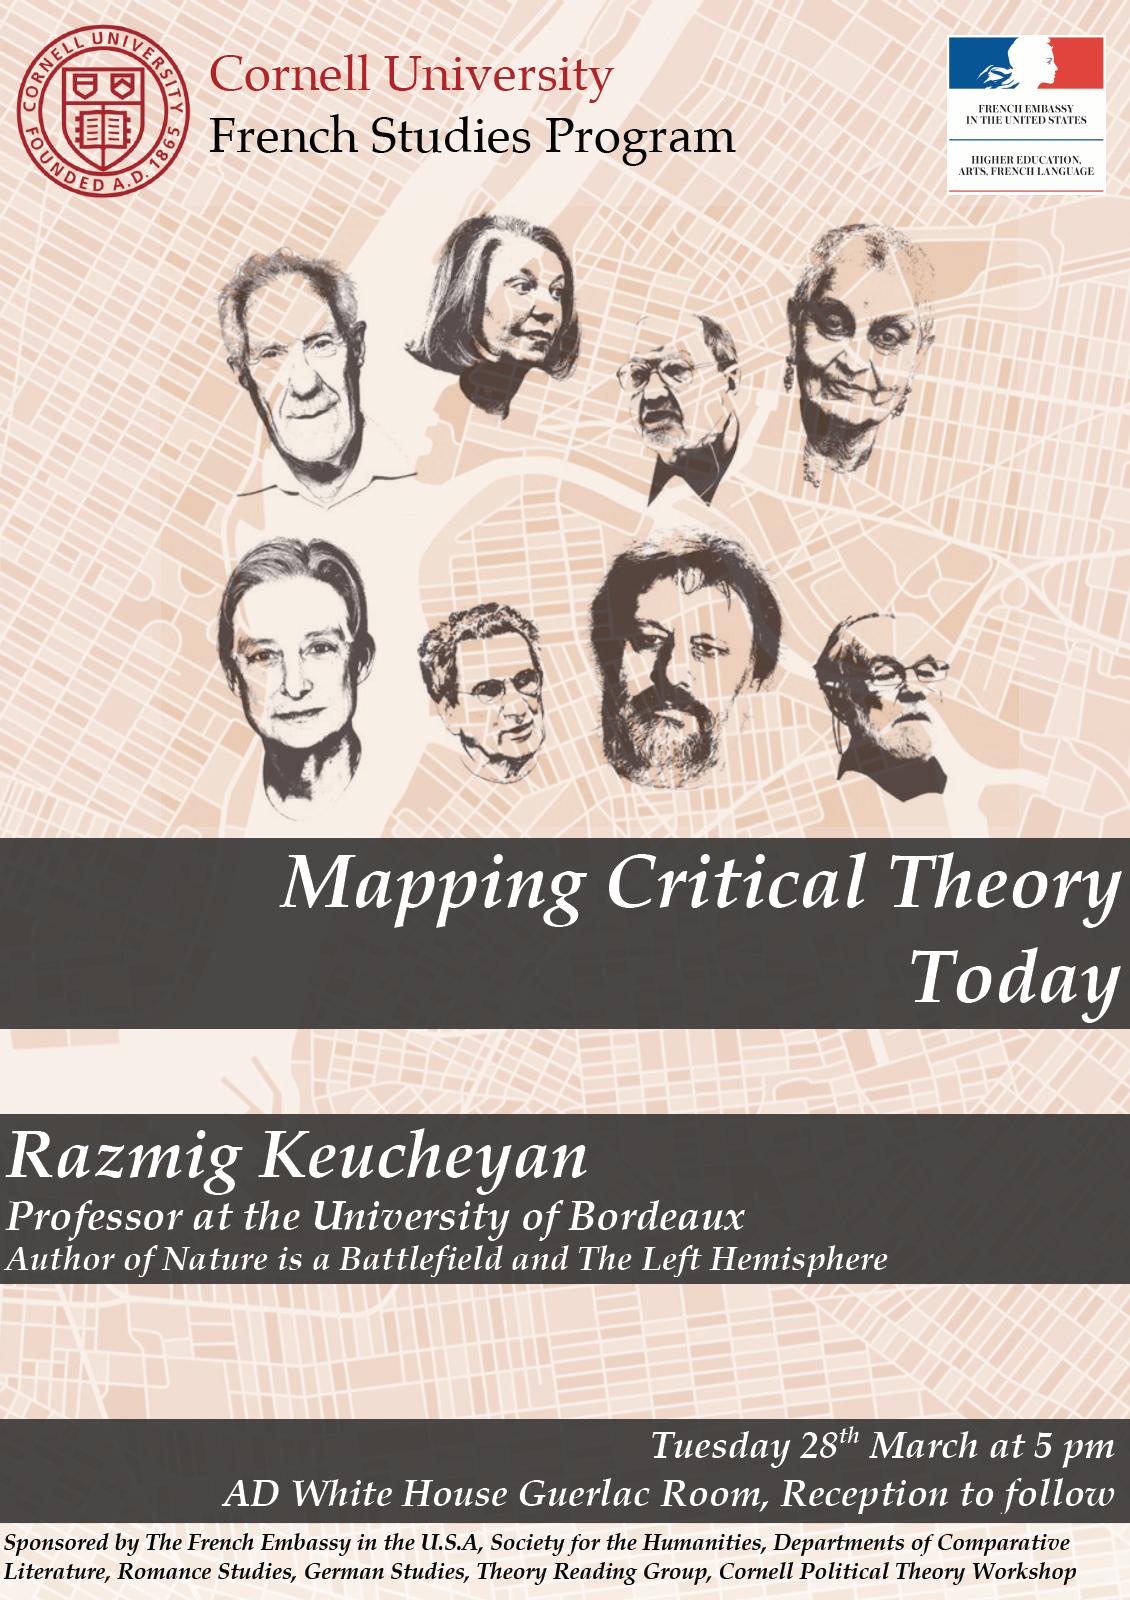 Razmig Keucheyan: Mapping Critical Theory Today